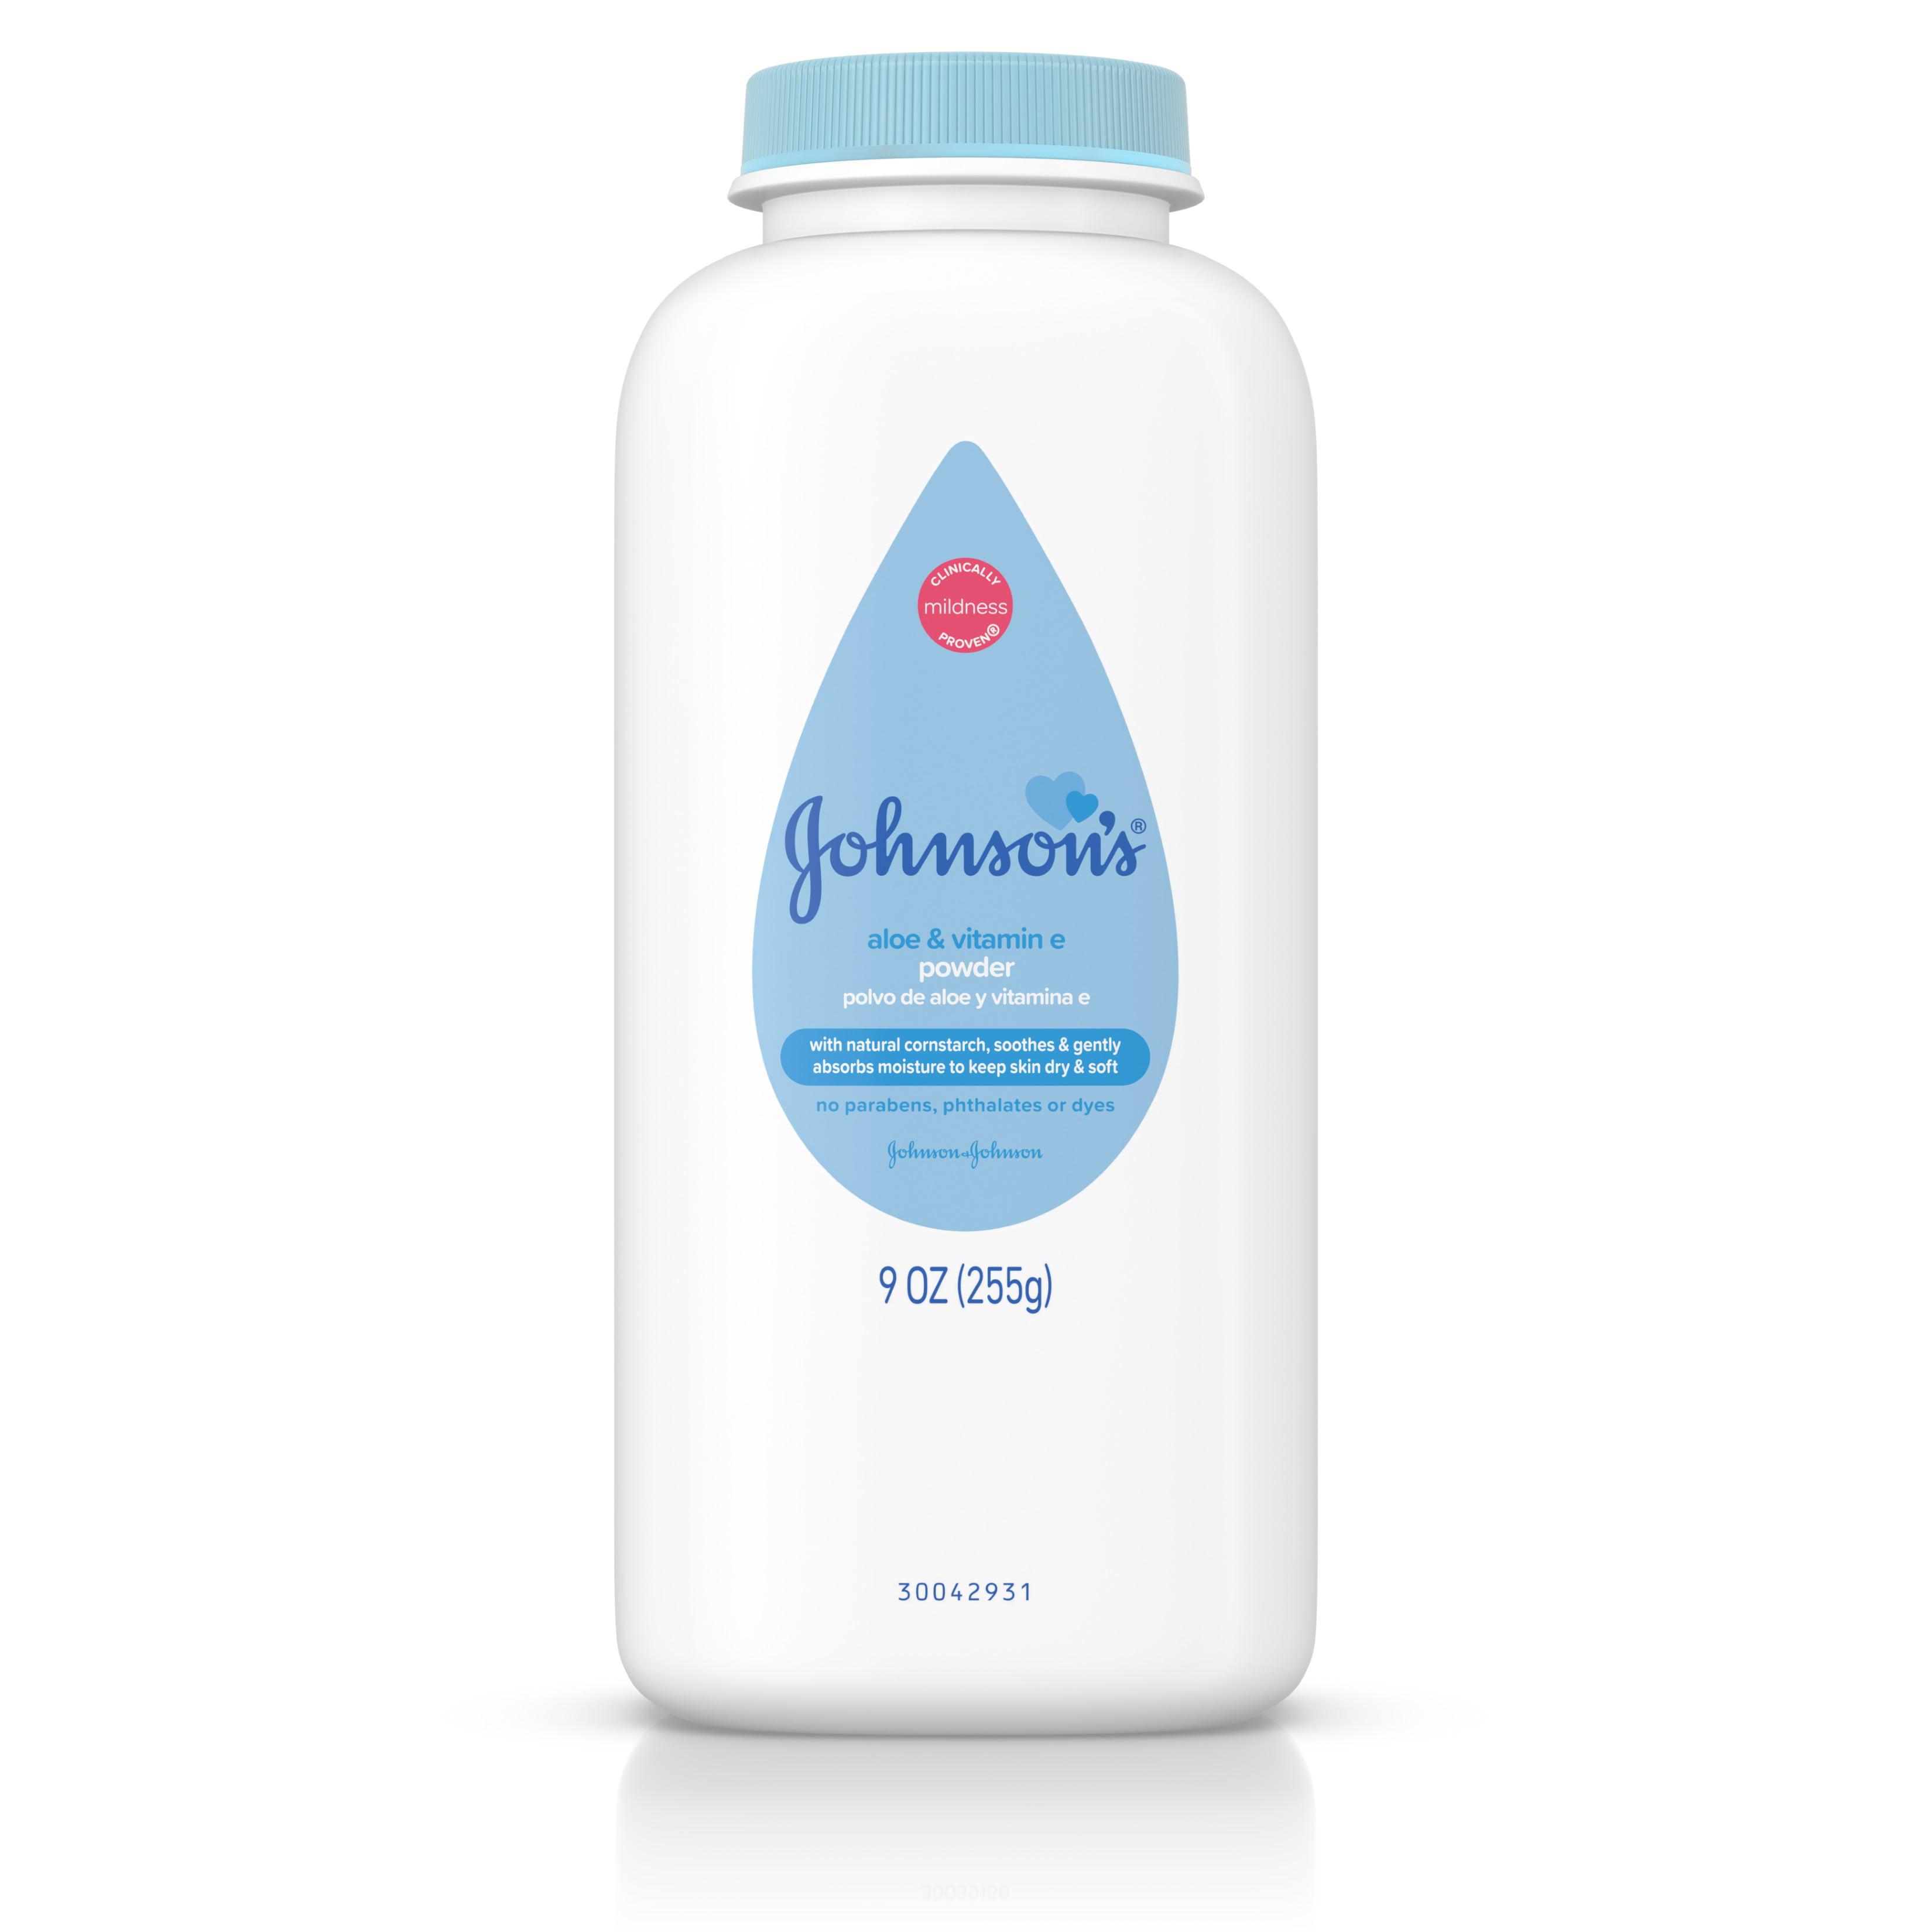 (2 pack) Johnsons Baby Powder With Aloe Vera & Vitamin E, Diaper Rash Protection, 22 Oz. by Johnson & Johnson